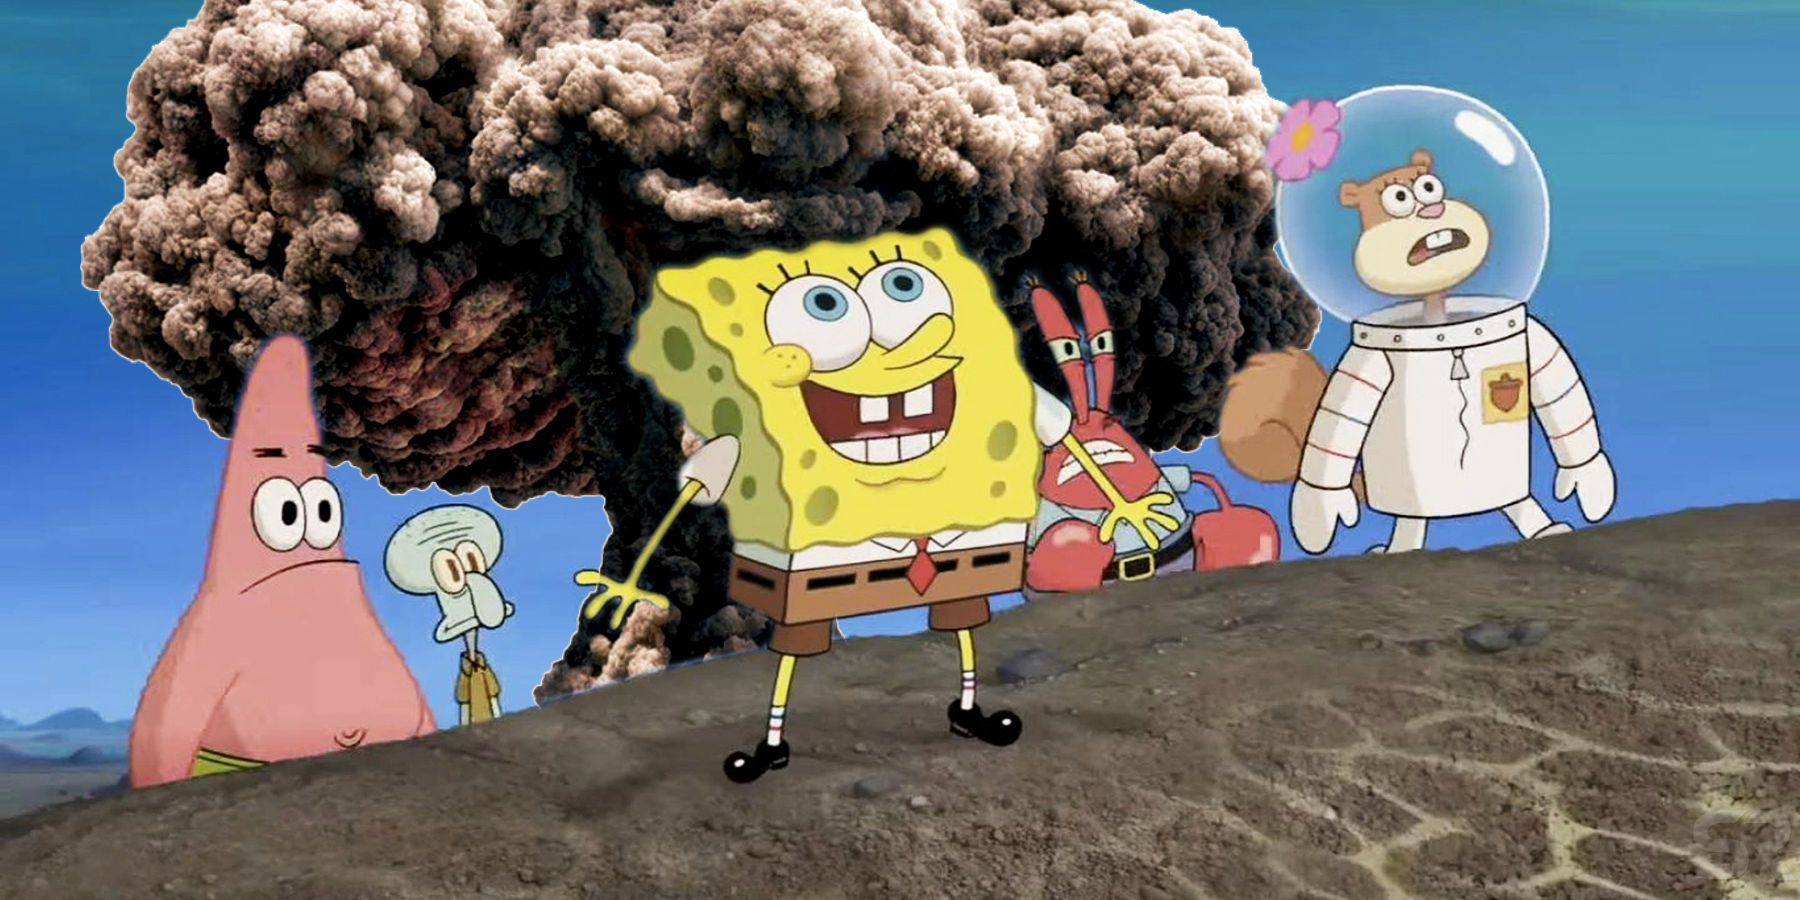 SpongeBob SquarePants Theory: Bikini Bottom Is A Nuclear Test Site